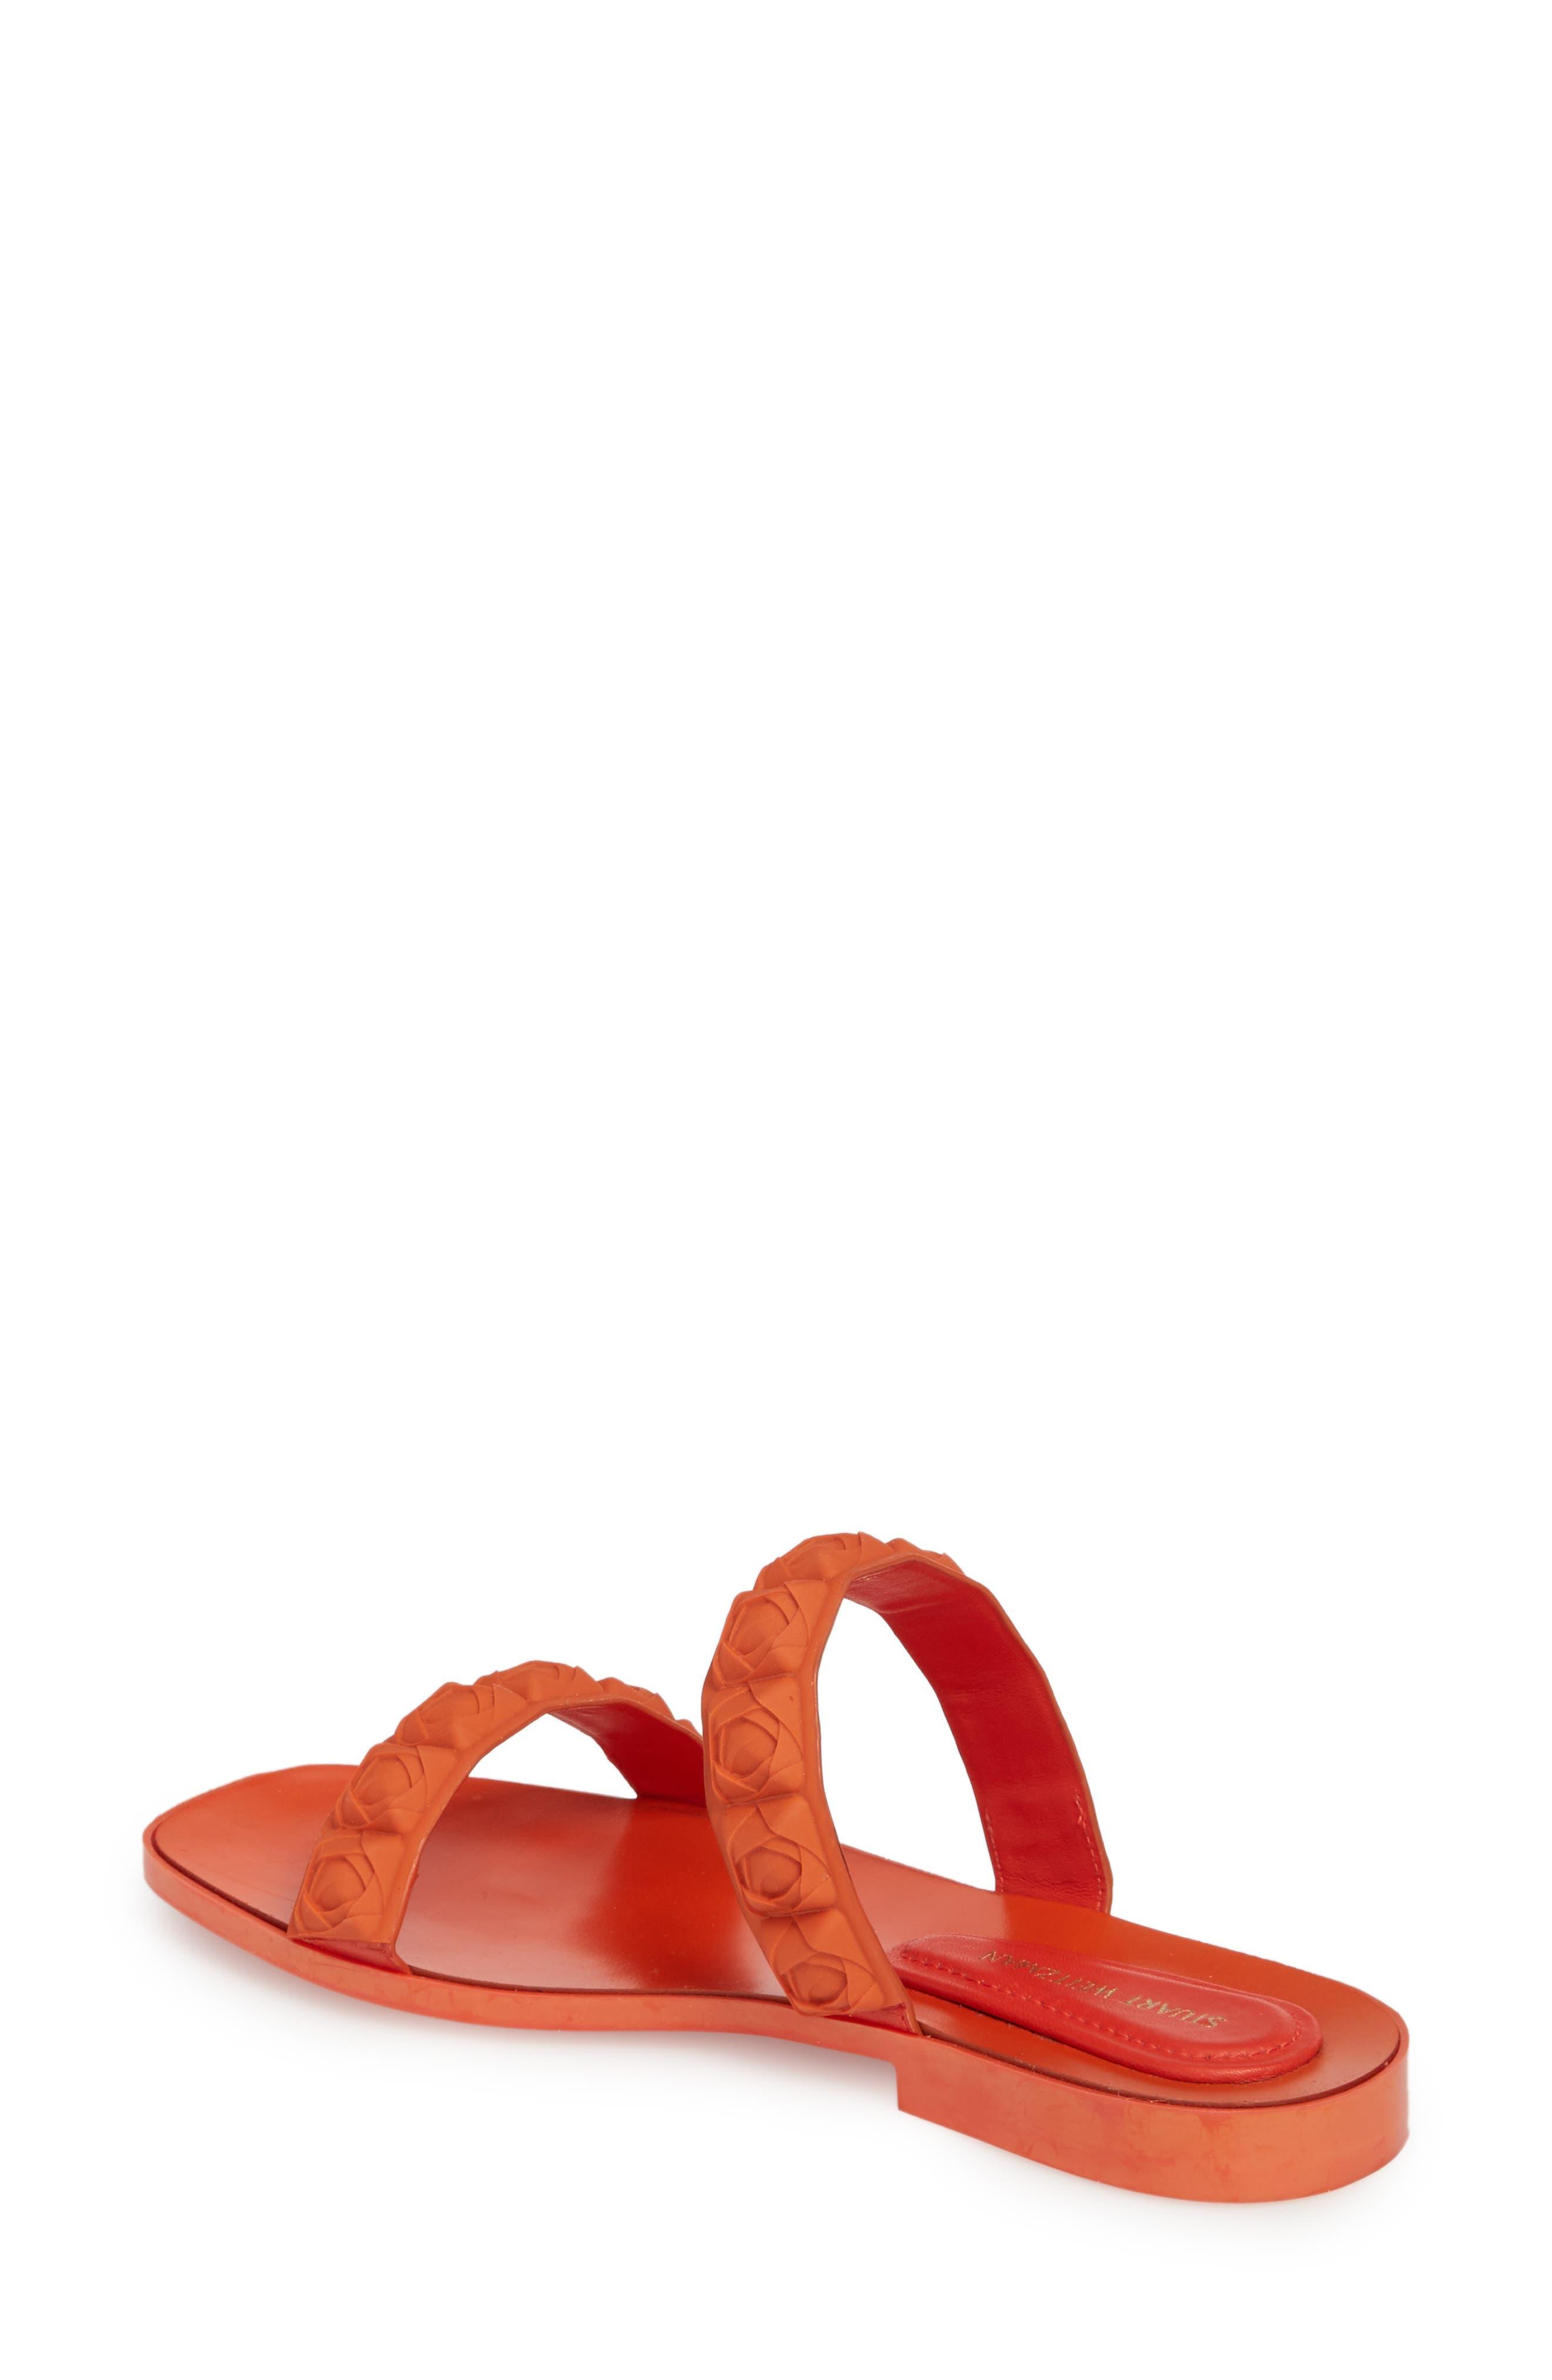 Rosita Dual Strap Slide Sandal,                             Alternate thumbnail 10, color,